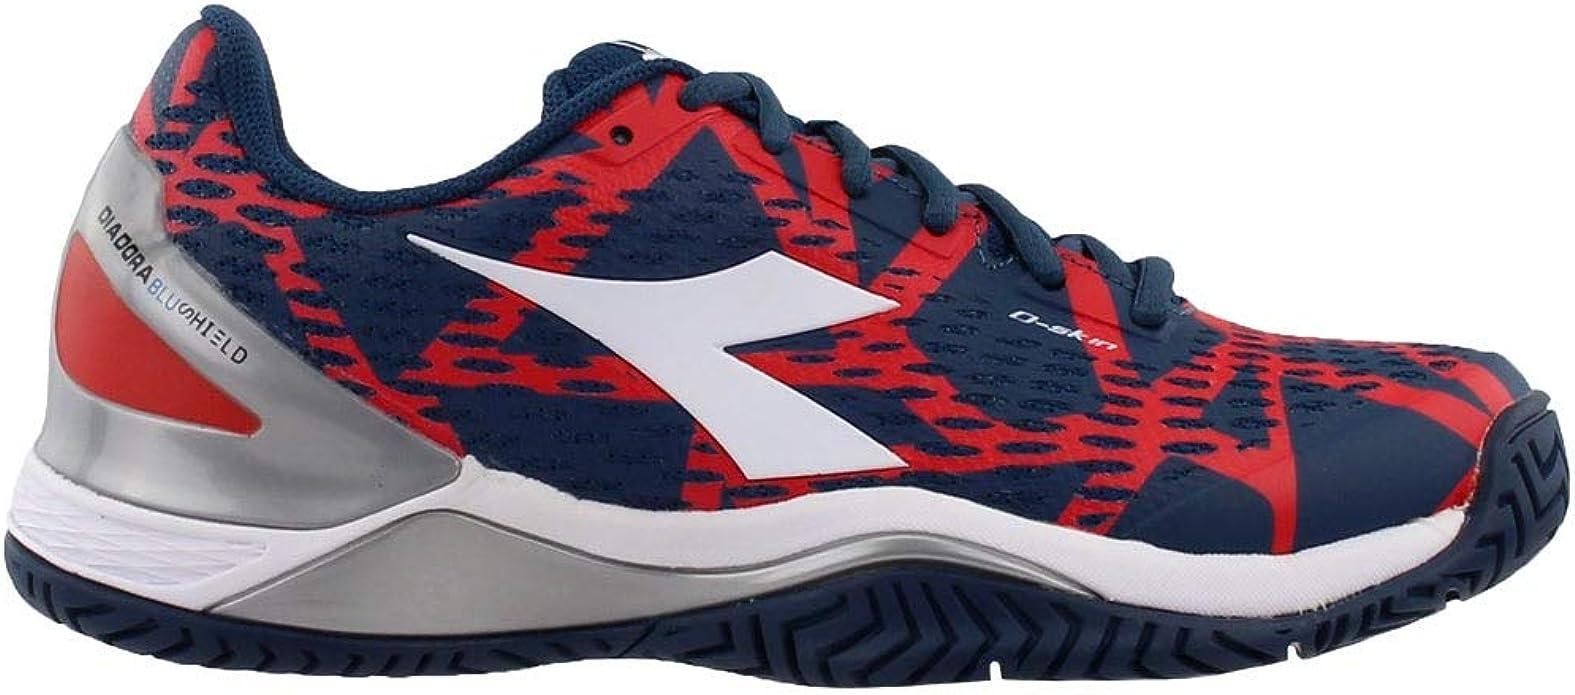 Diadora Speed Blushield 2 Mens Tennis Shoe: Amazon.it